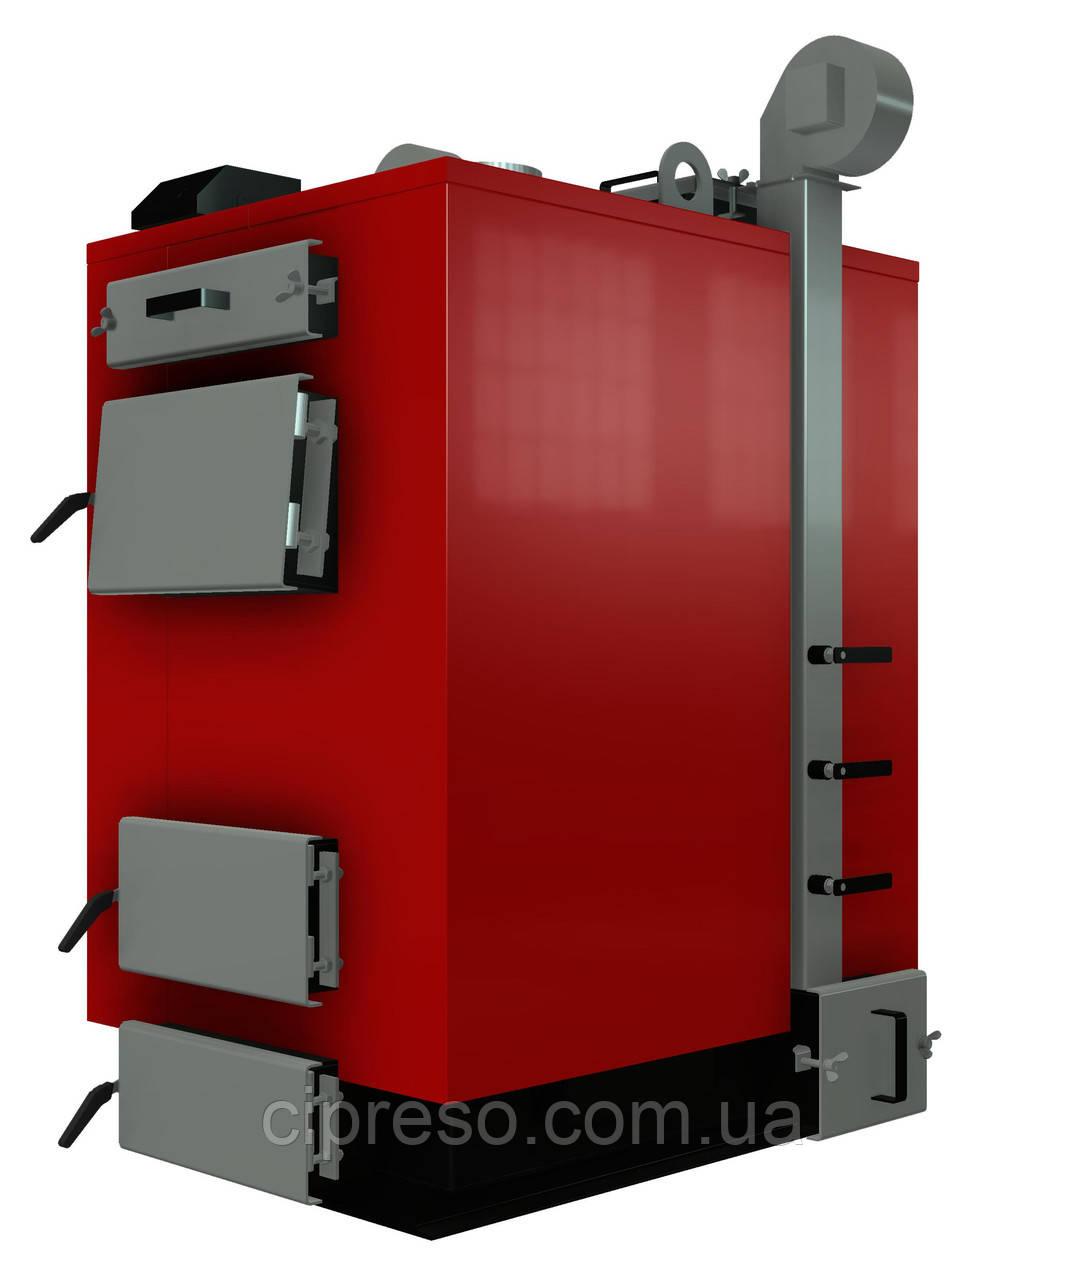 Твердотопливный котел ALtep КТ-3Е 80 кВт, фото 1